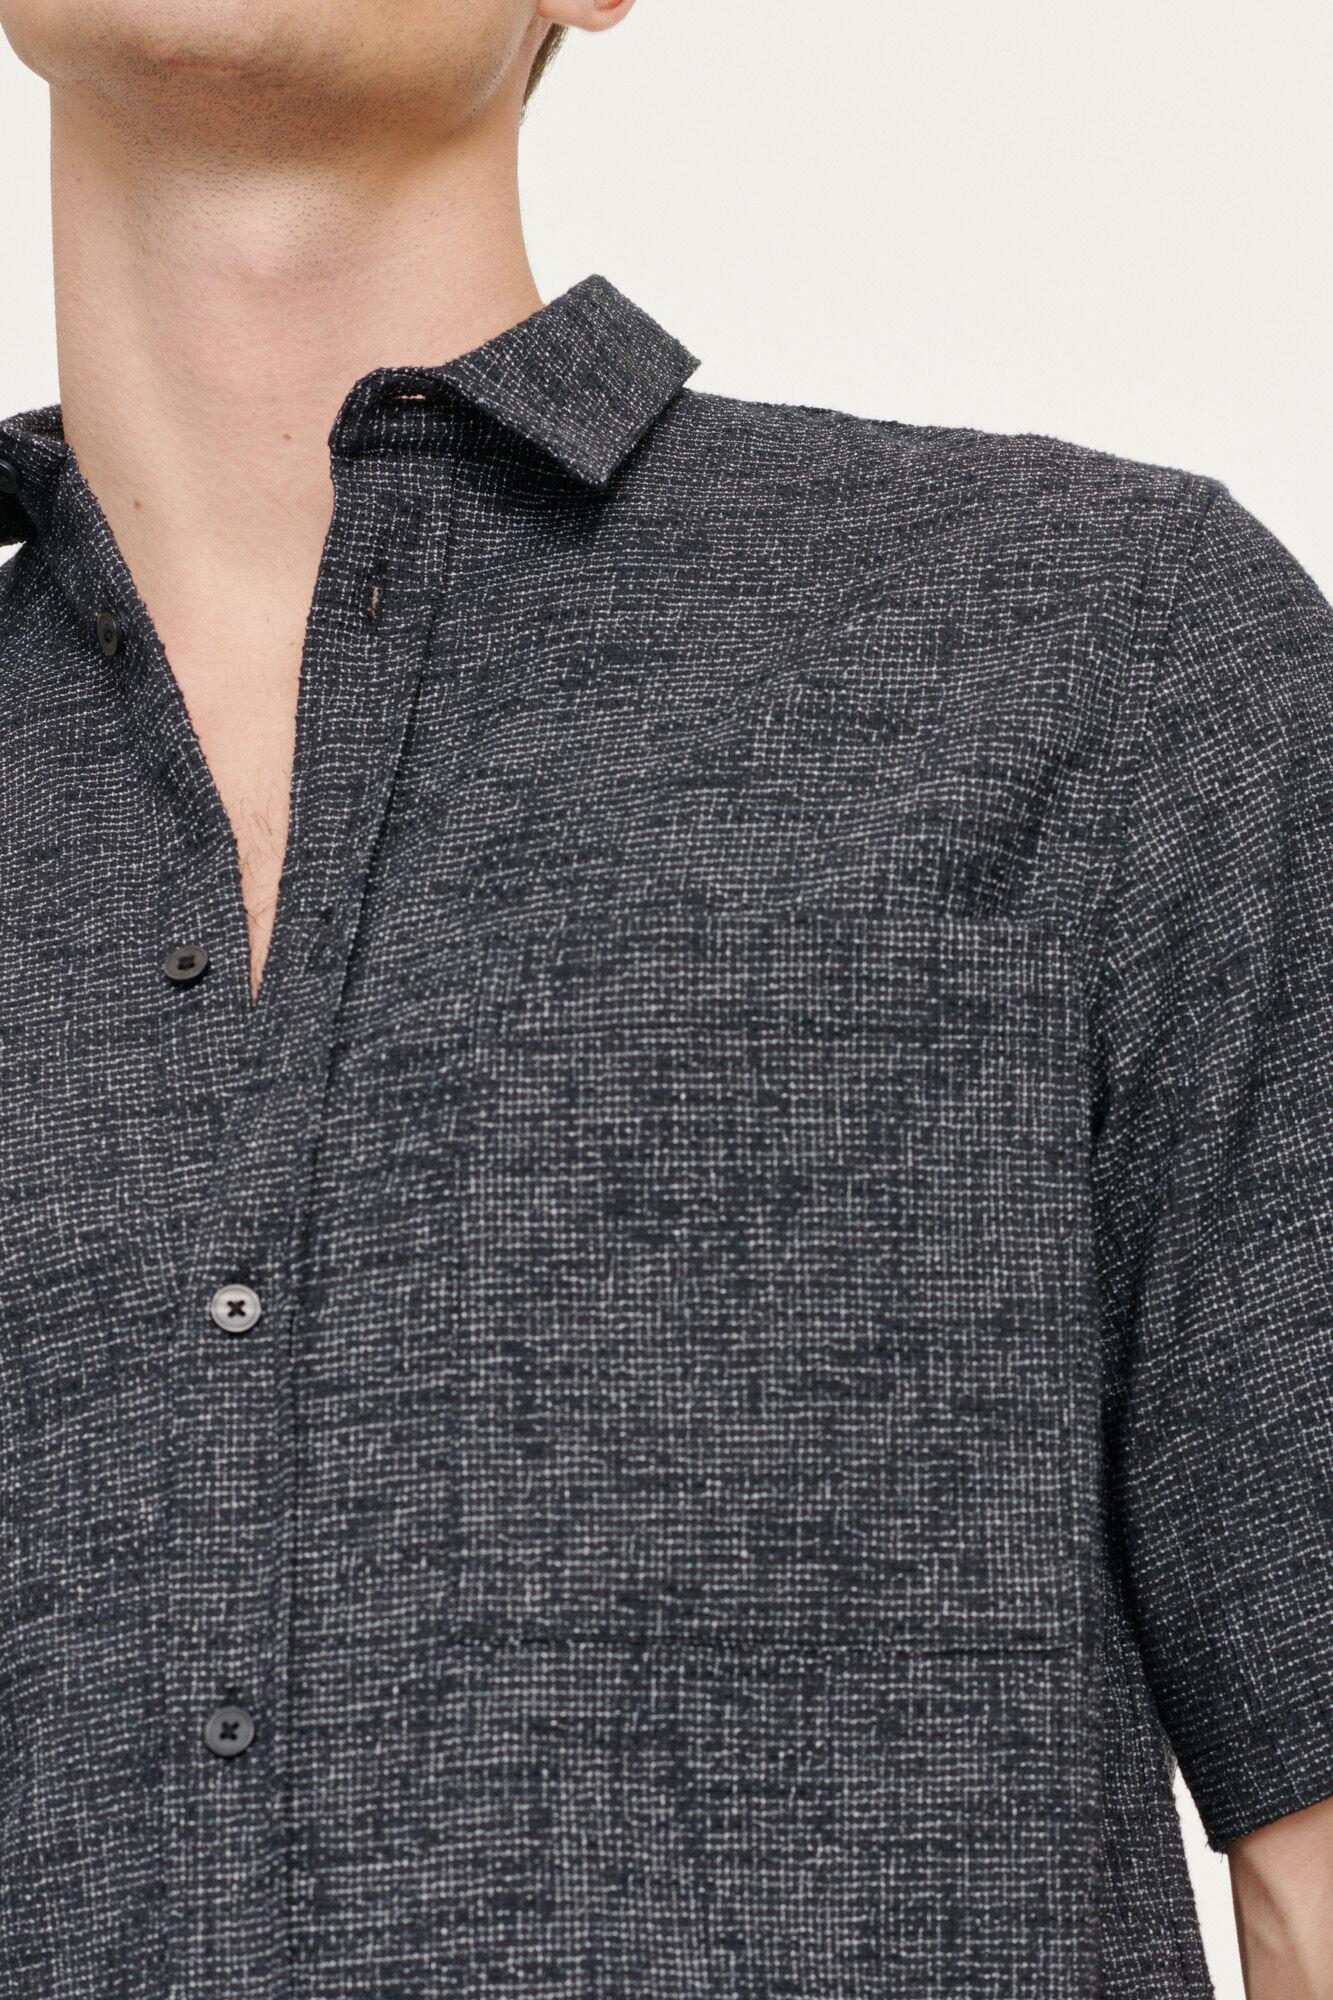 Taro NO shirt 11529, BLACK MEL.